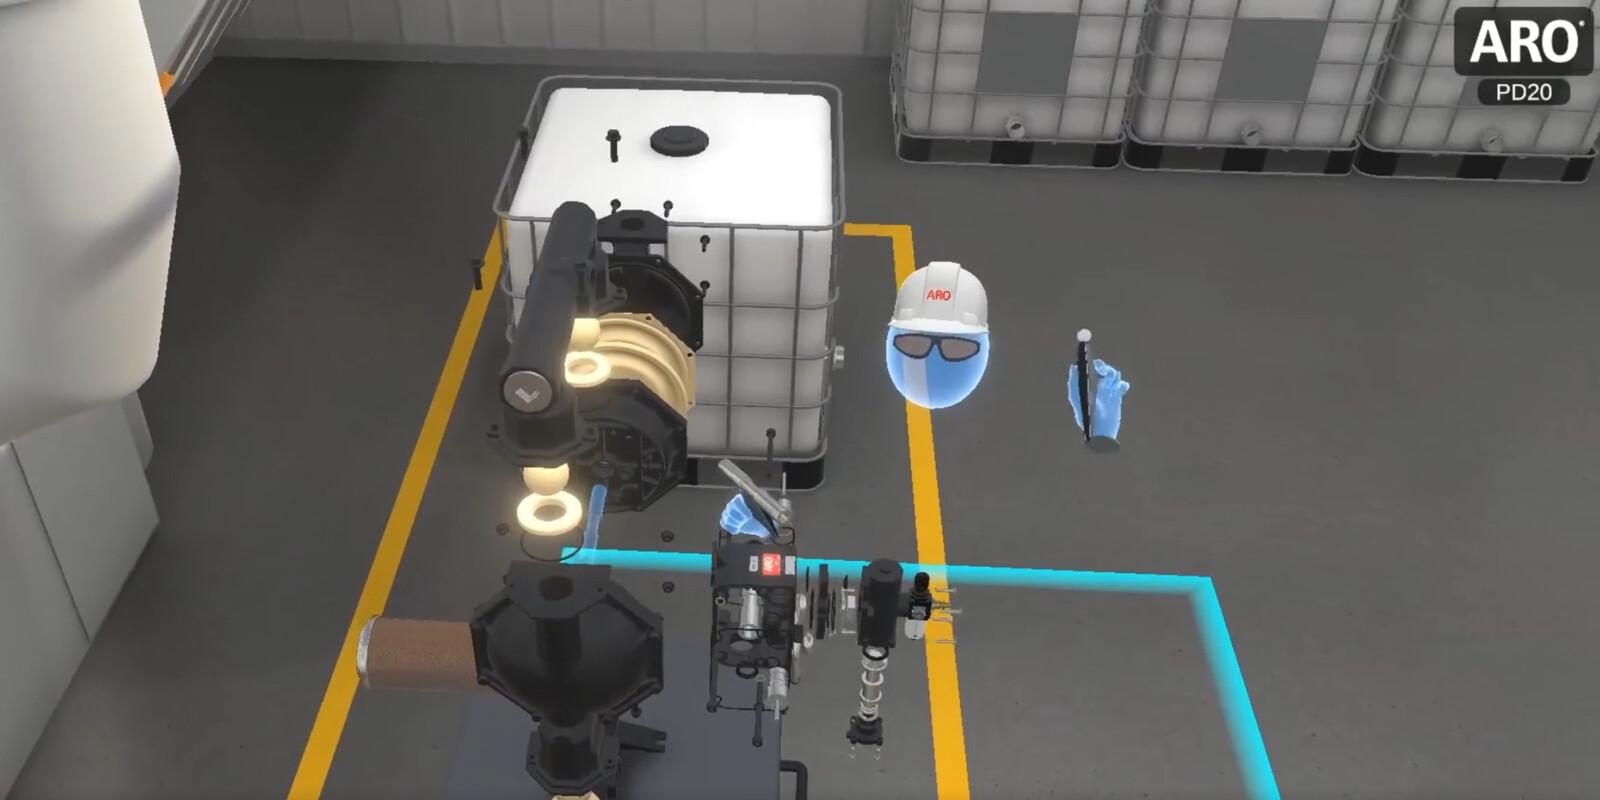 ARO PD20 Virtual Reality Experience